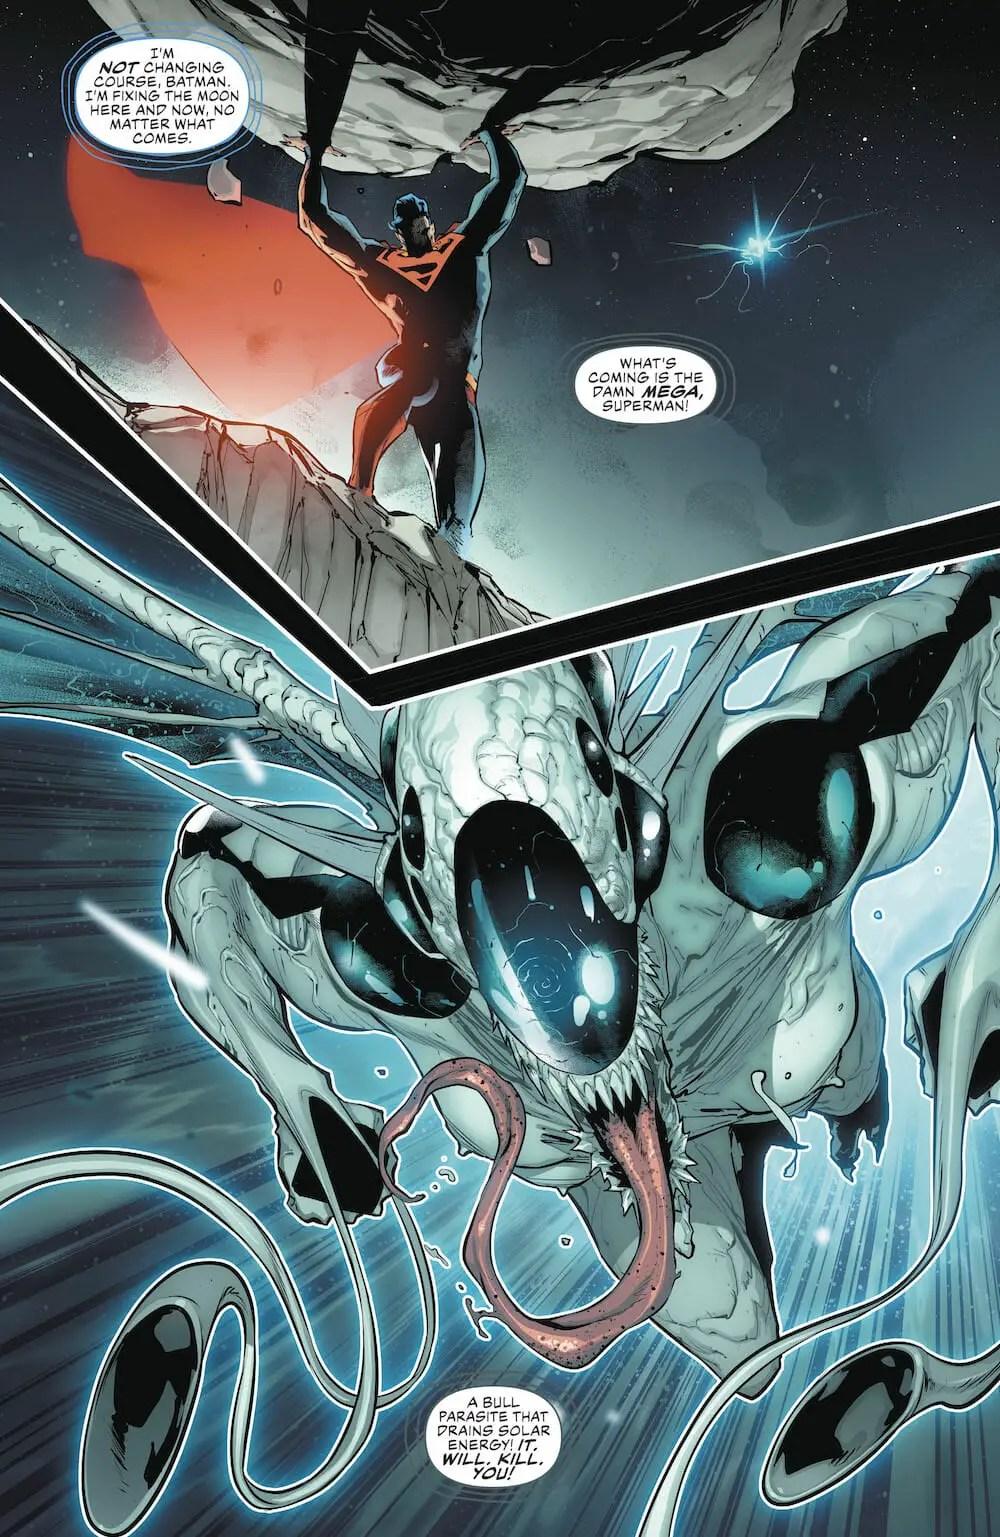 Justice League #9 Review - Comic Book Revolution